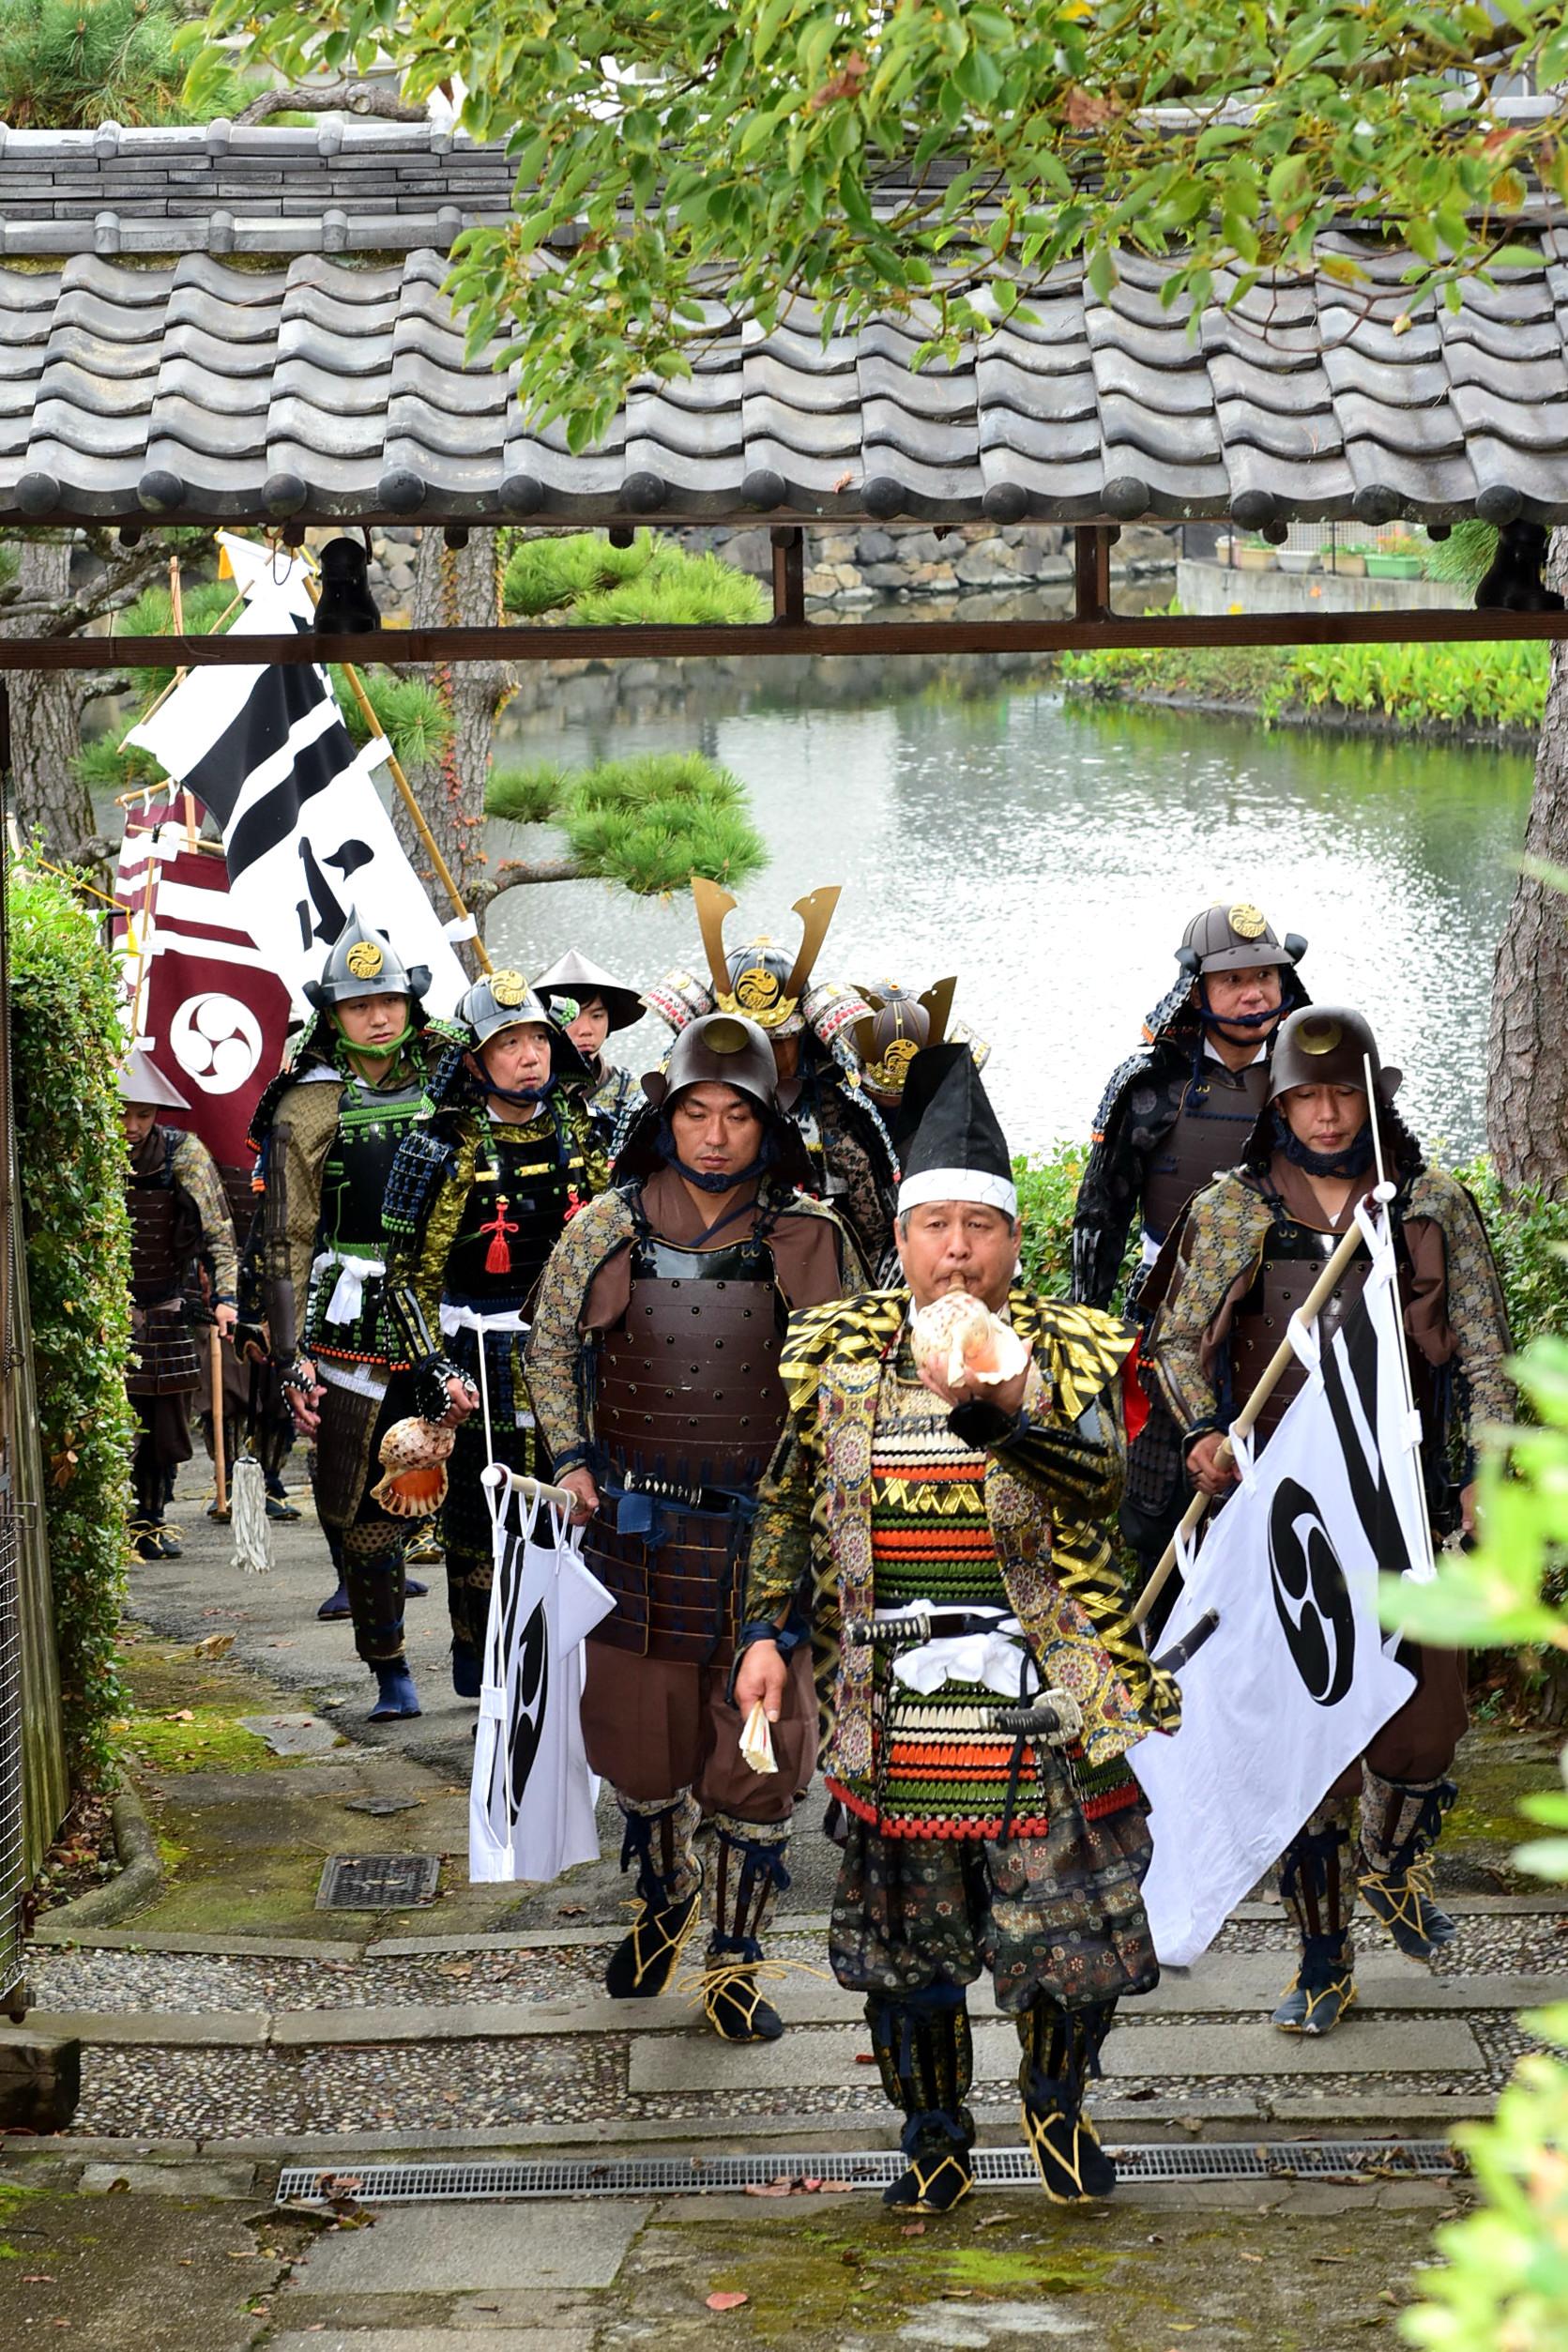 小早川甲冑部隊行列練り歩き